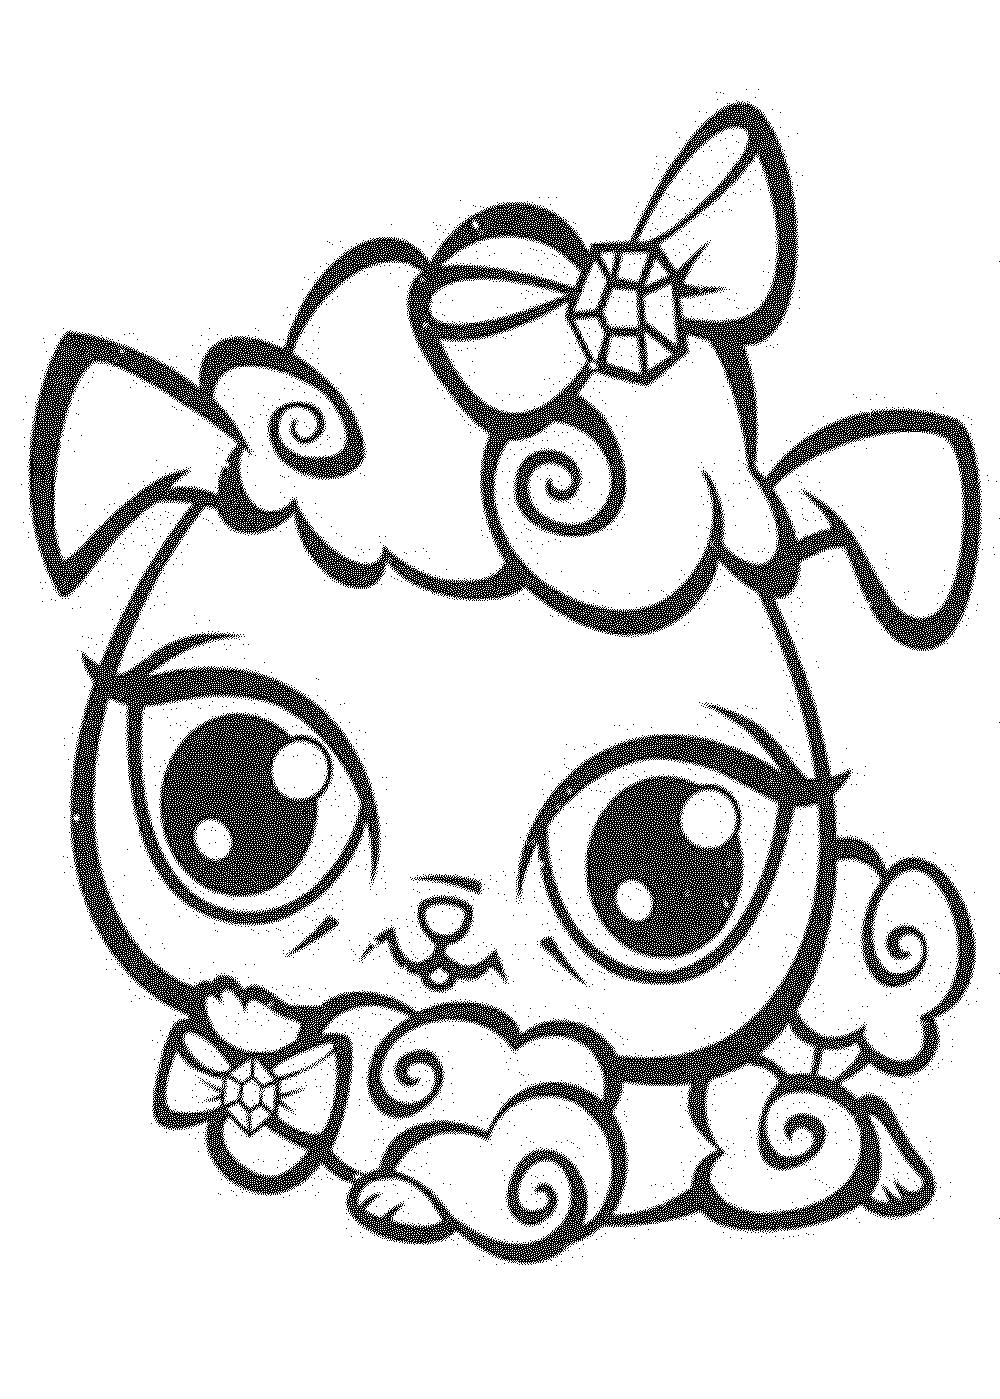 free printable littlest pet shop coloring pages littlest pet shop coloring pages for kids free printables littlest free pages pet shop coloring printable